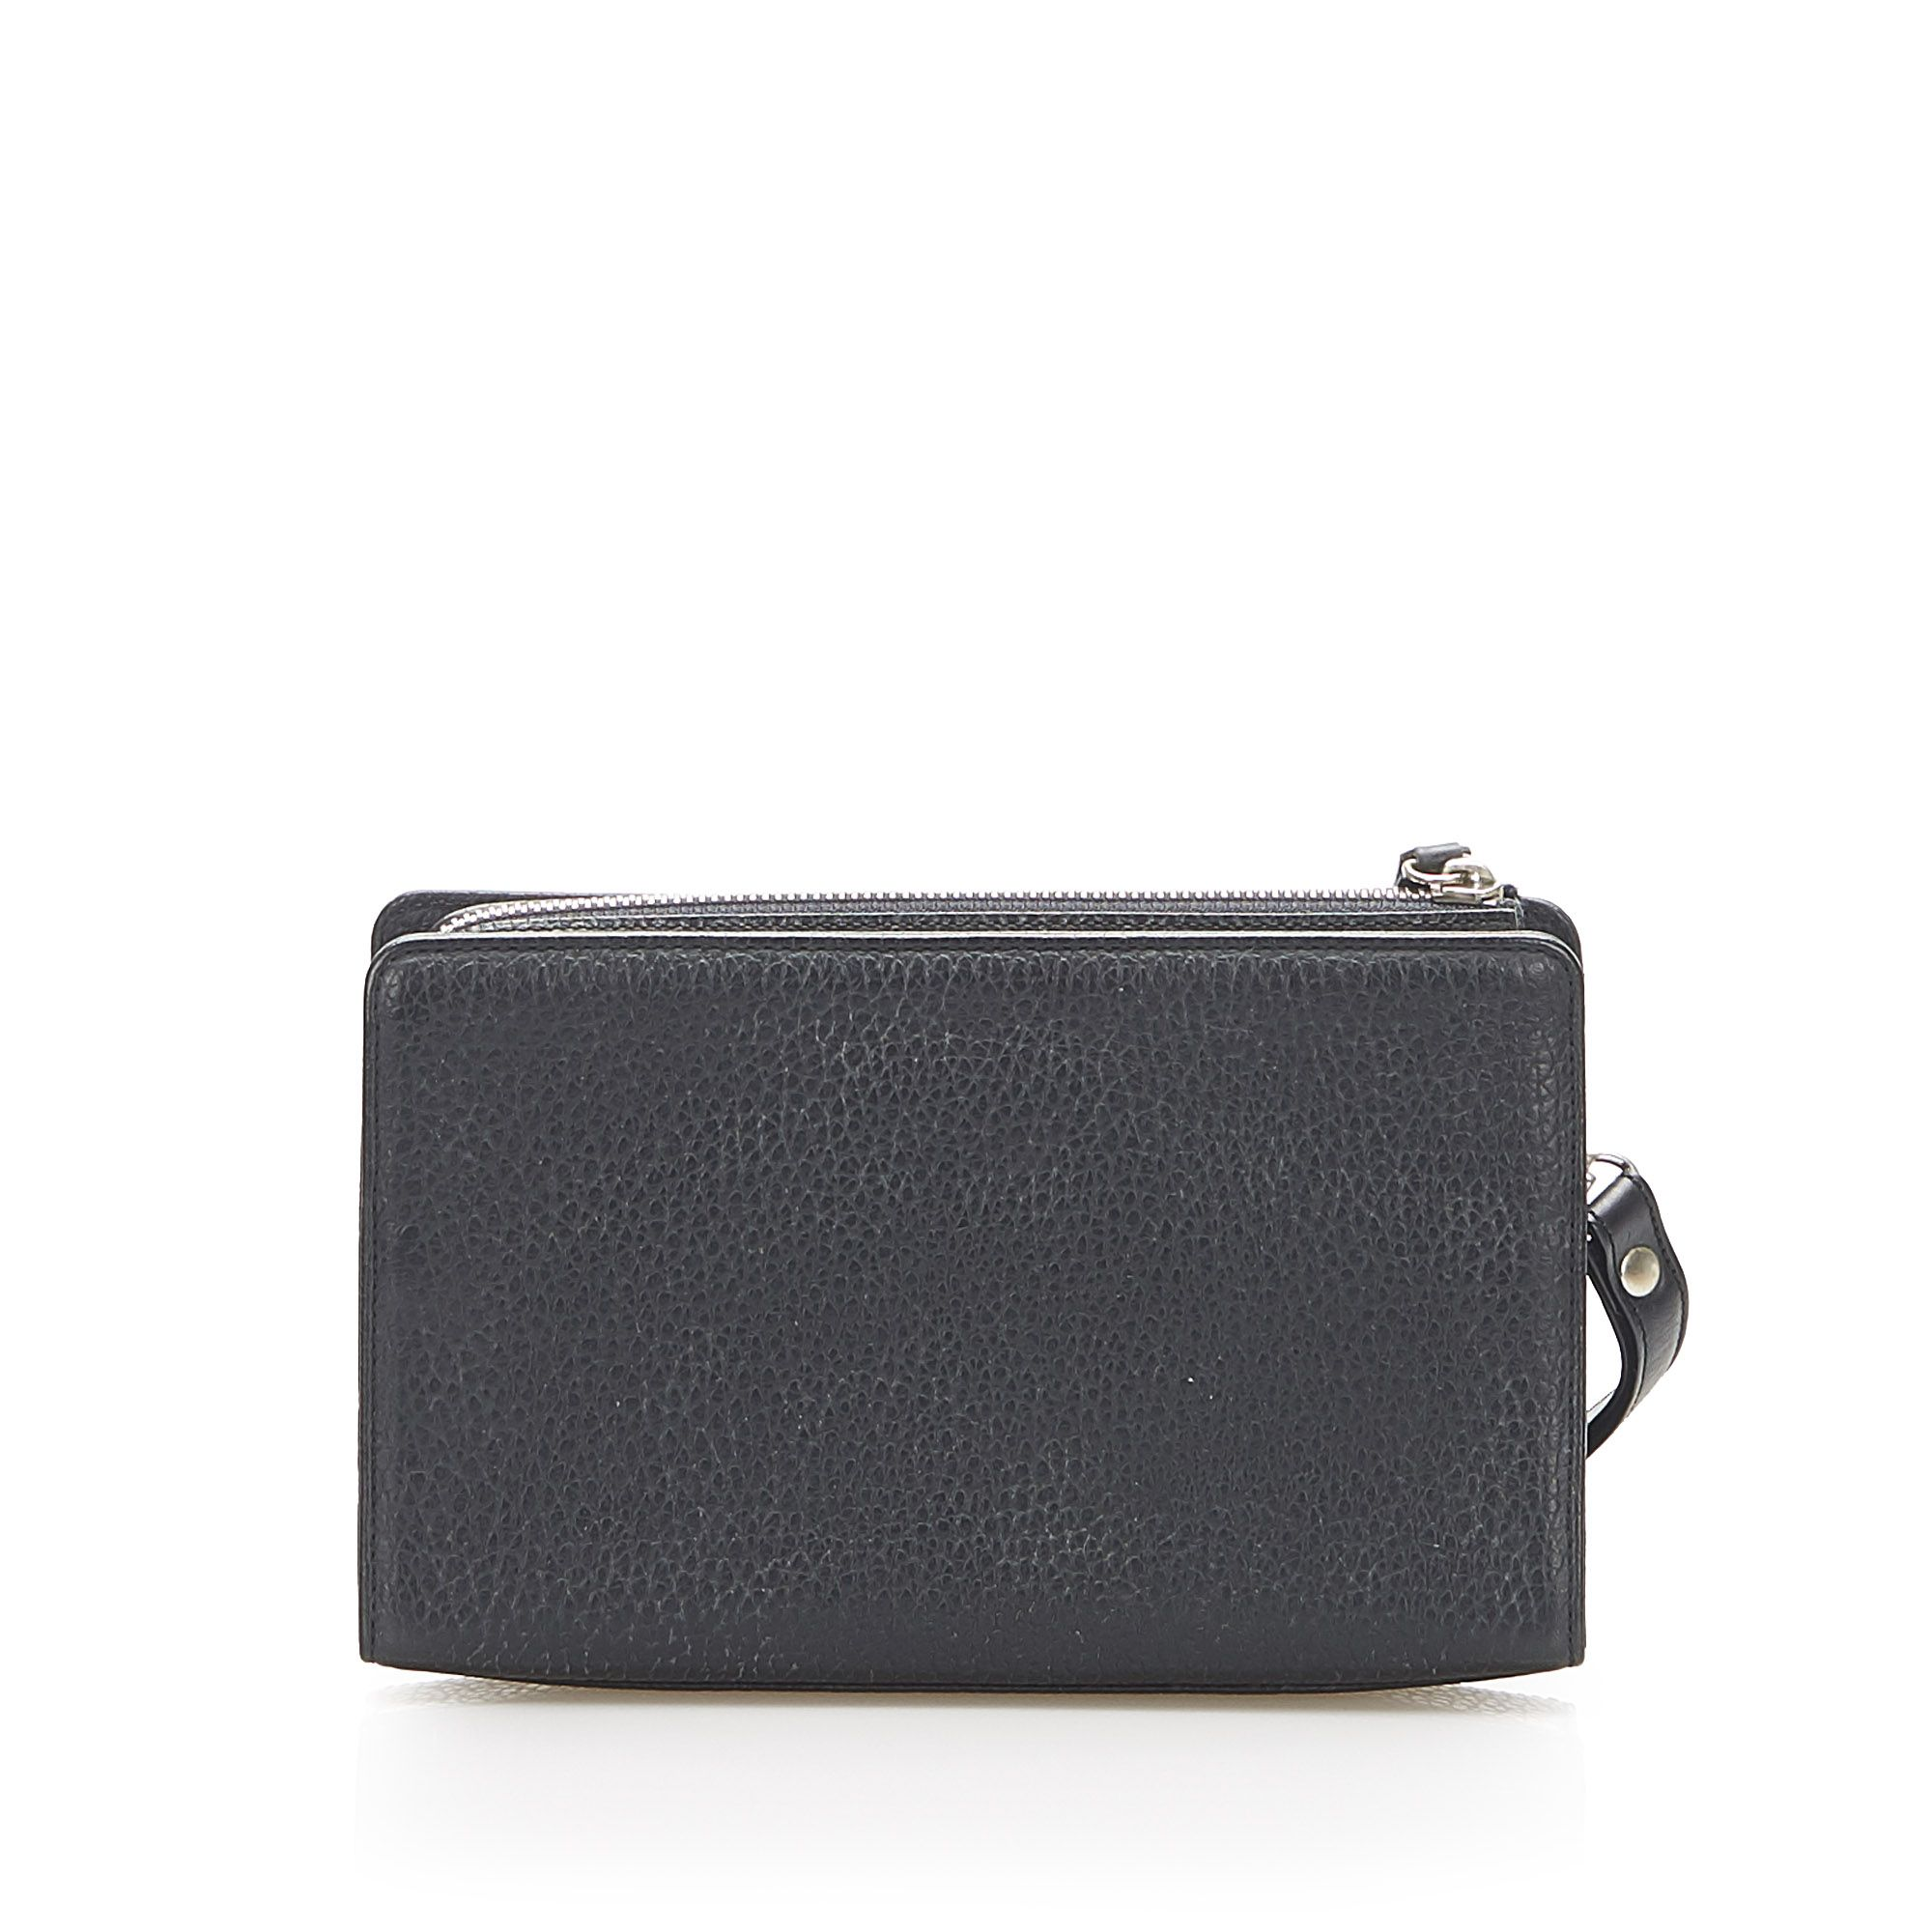 Vintage Burberry Leather Clutch Black